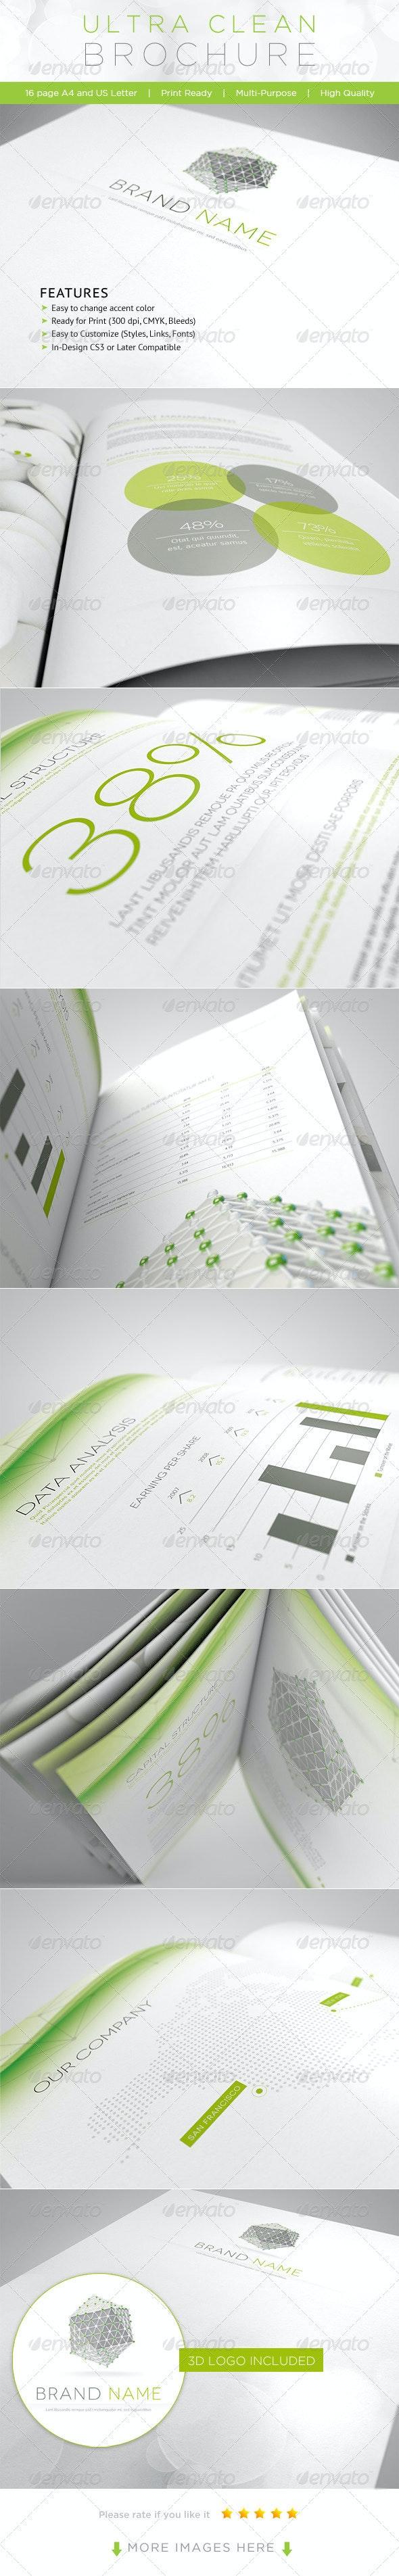 Ultra Clean Brochure - Corporate Brochures